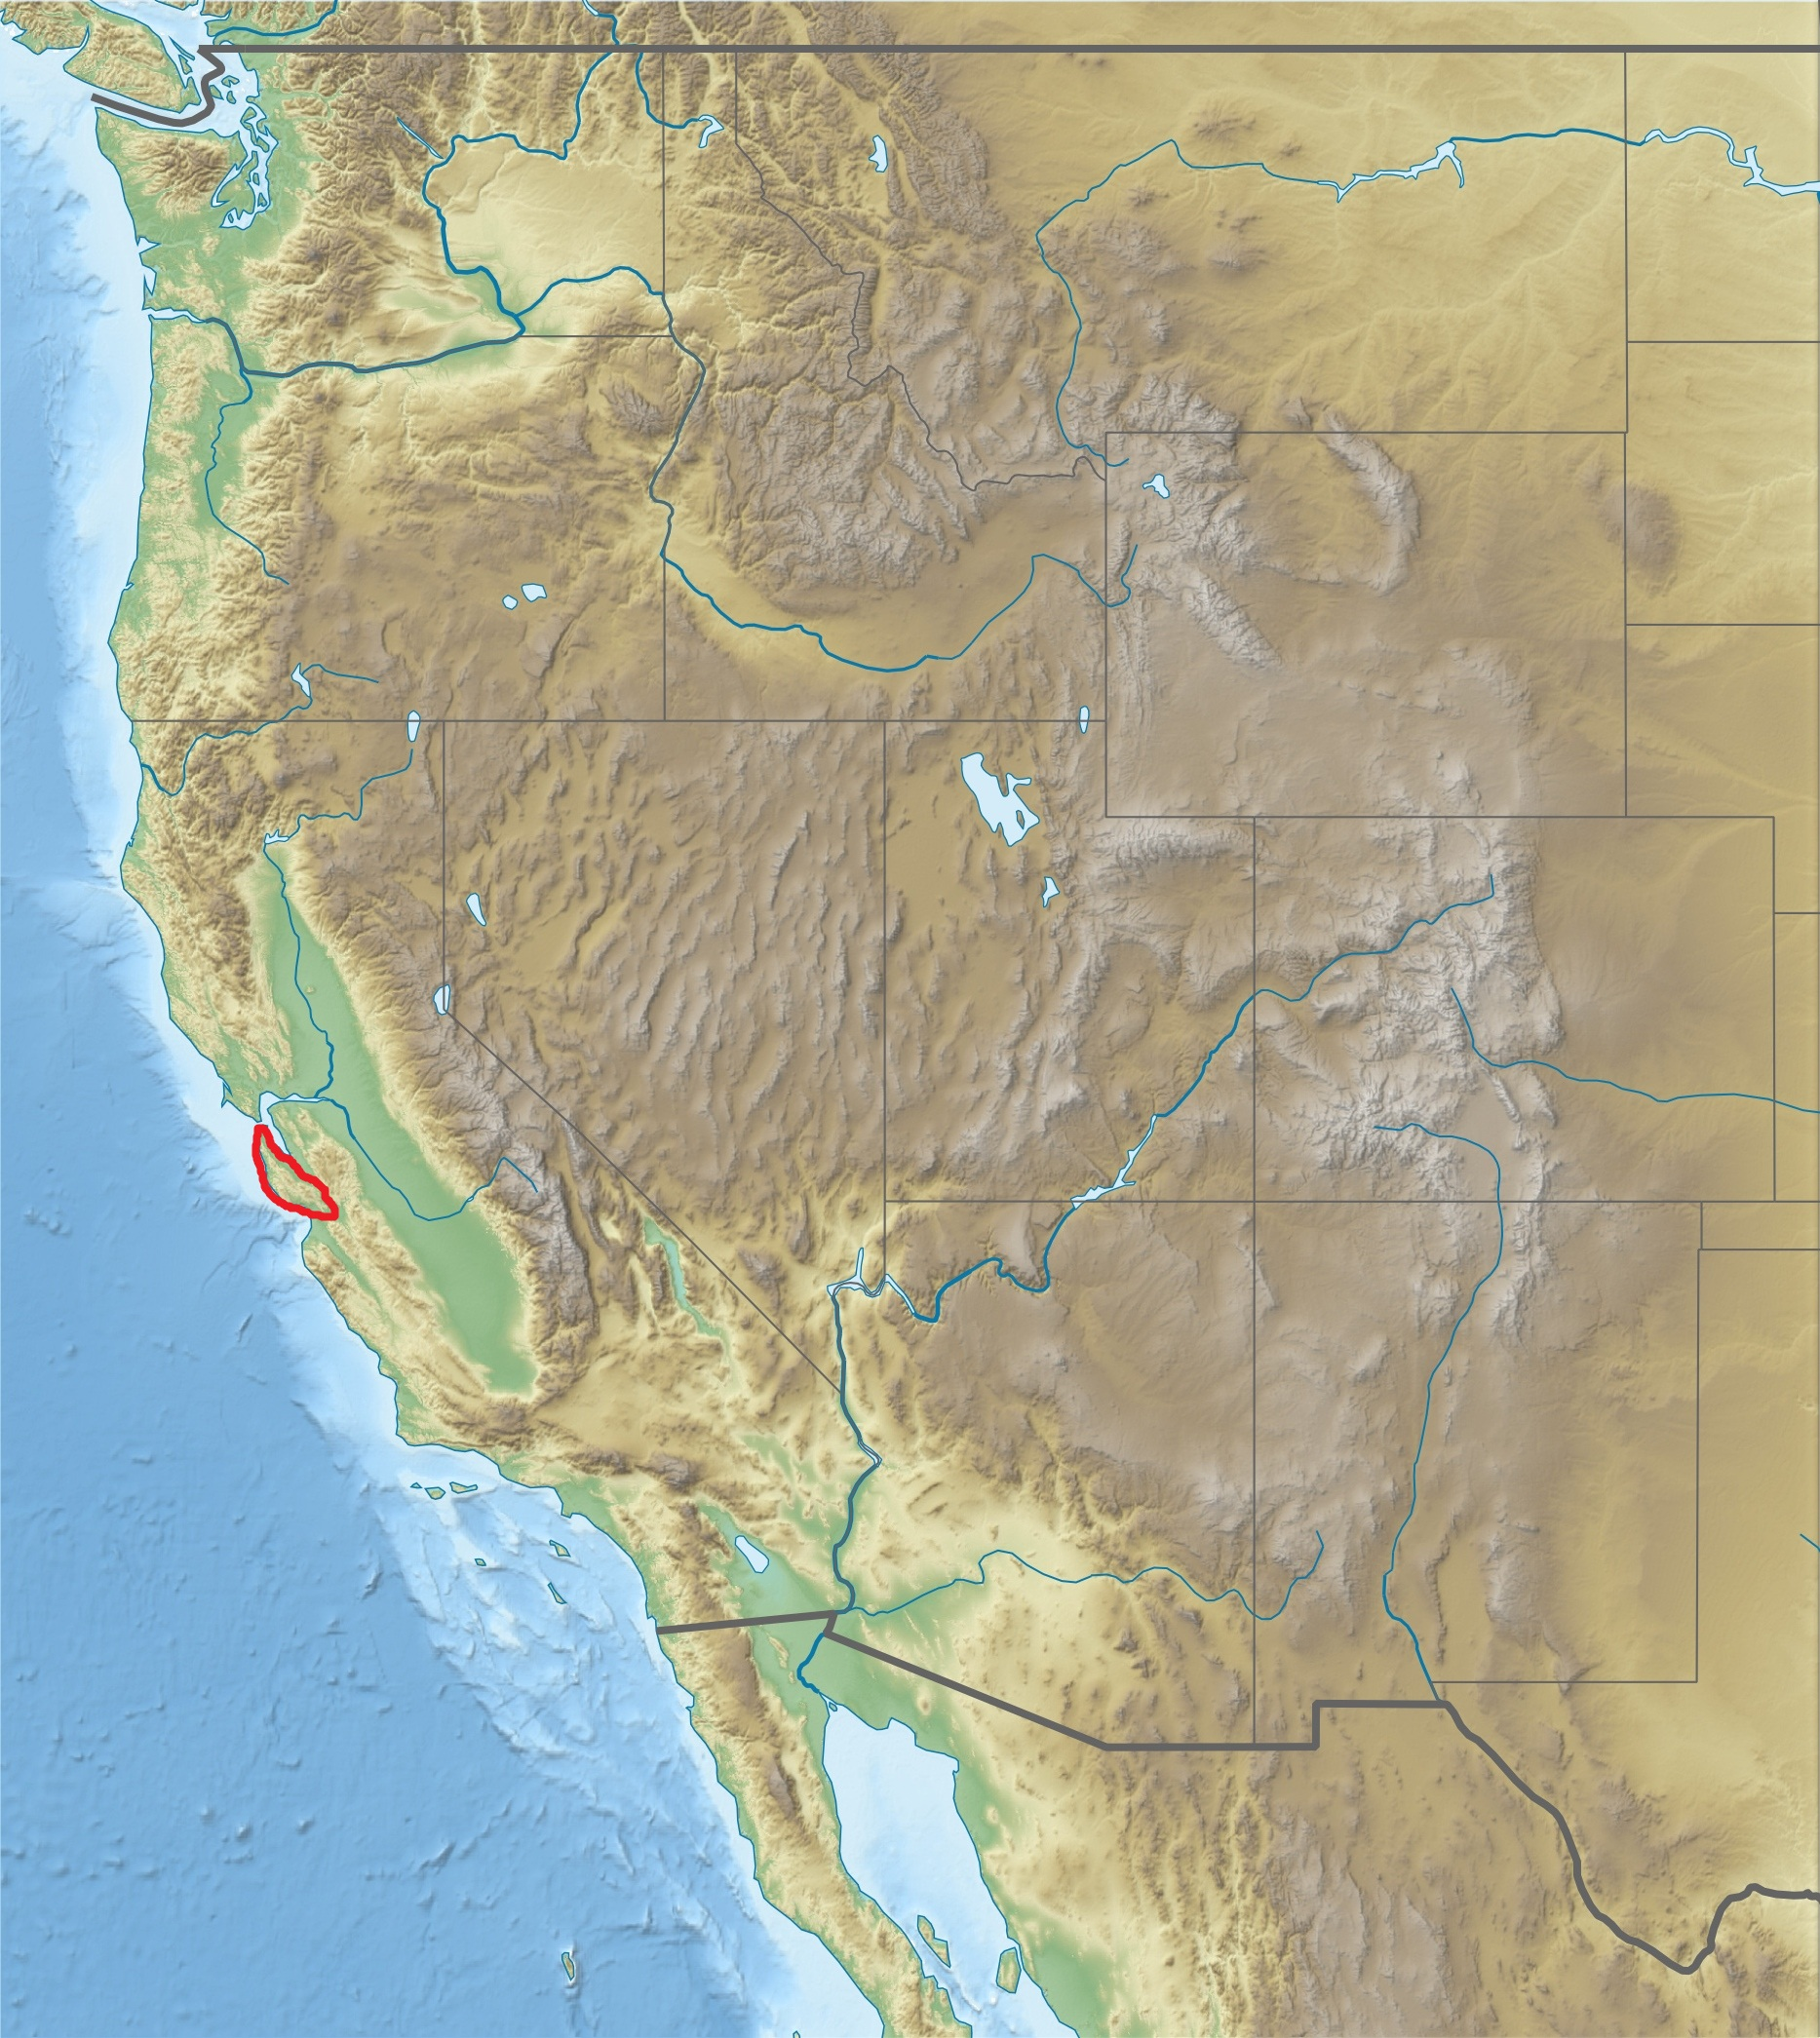 FileUSA Region West Relief Santa Cruz Mountains Location Mapjpg - Us relief map